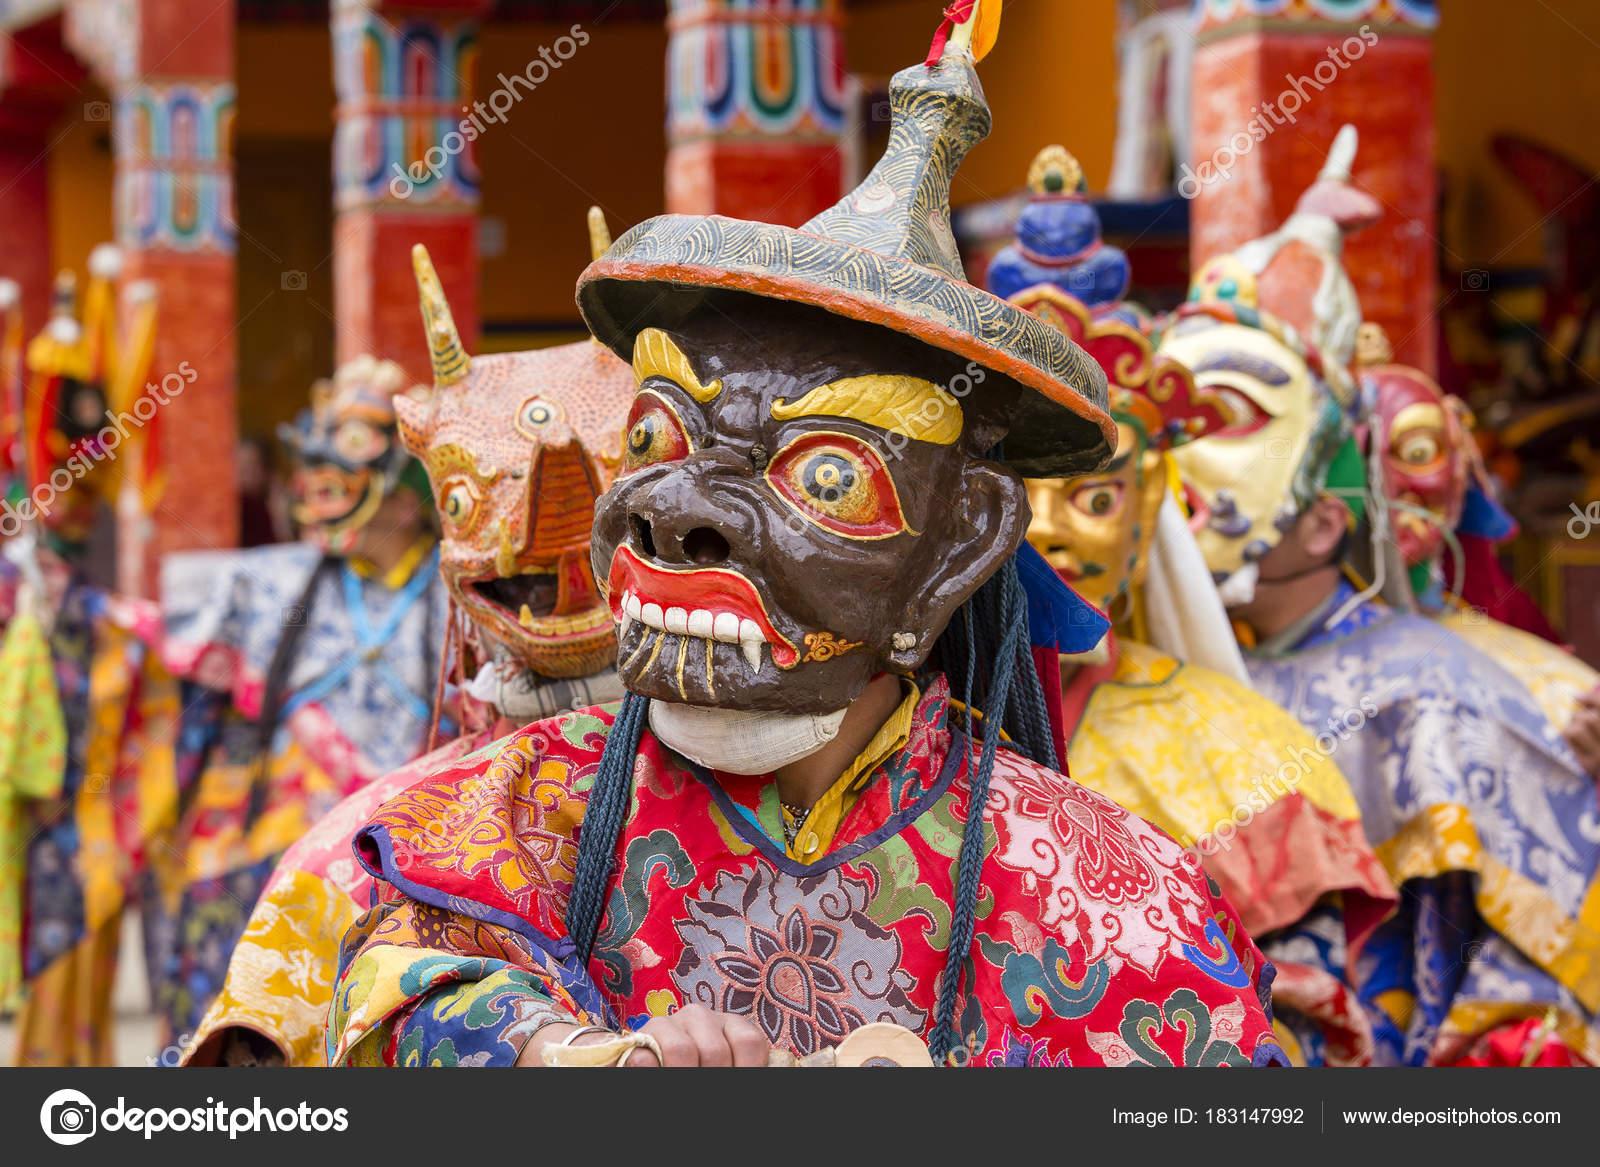 985b4bba1 Buddhist lamas dressed in mystical mask dancing Tsam mystery dance in time  of Yuru Kabgyat Buddhist festival at Lamayuru Gompa, Ladakh, North India–  Stock ...